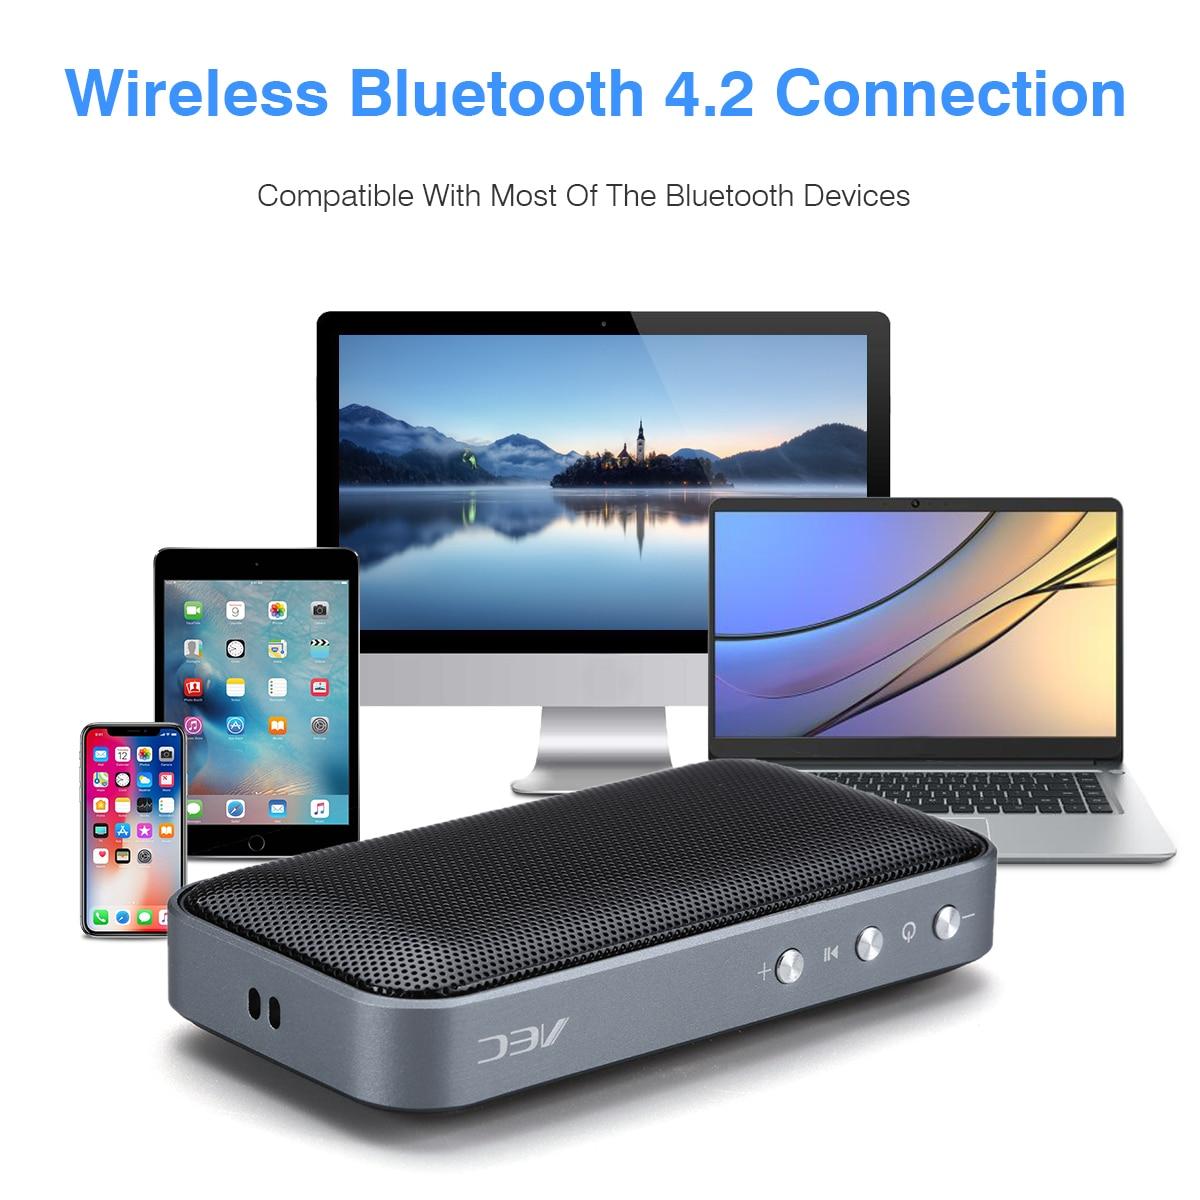 NEW Wireless Bluetooth 4.2 Speaker Portable Mini Stereo Loudspeaker Built In Mic